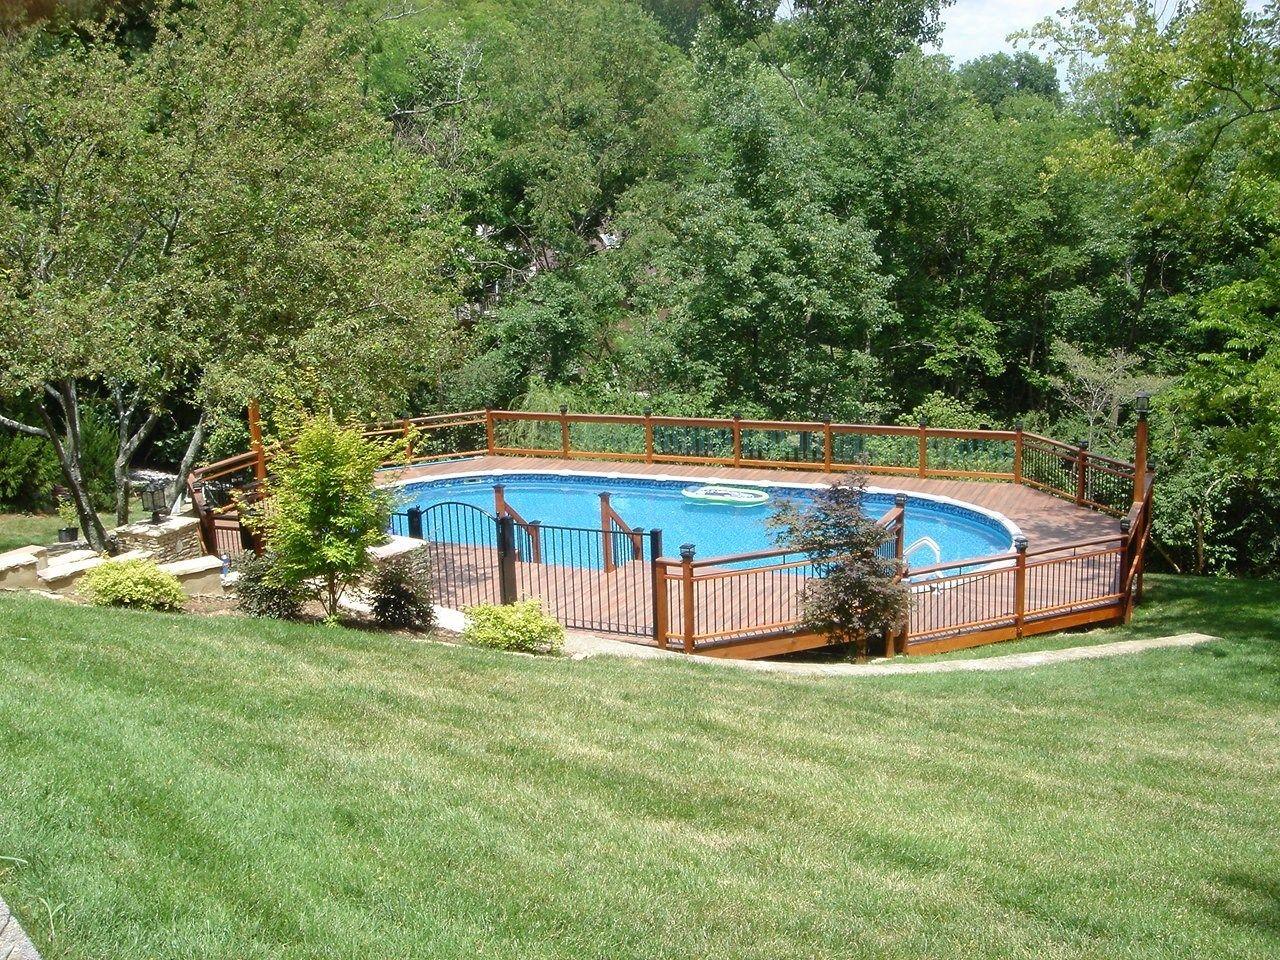 A Grand Backyard - Picture 3300